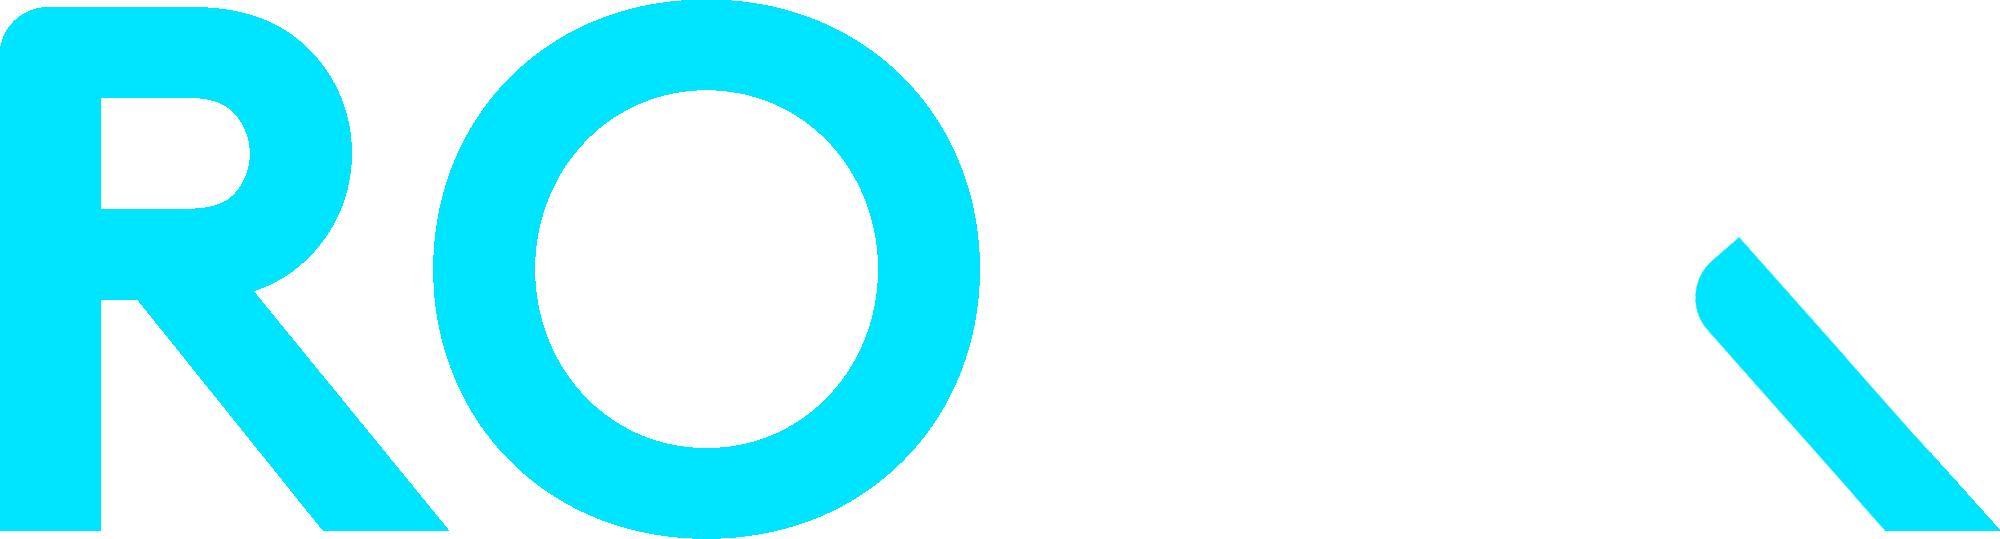 Robotic Equipment - logo